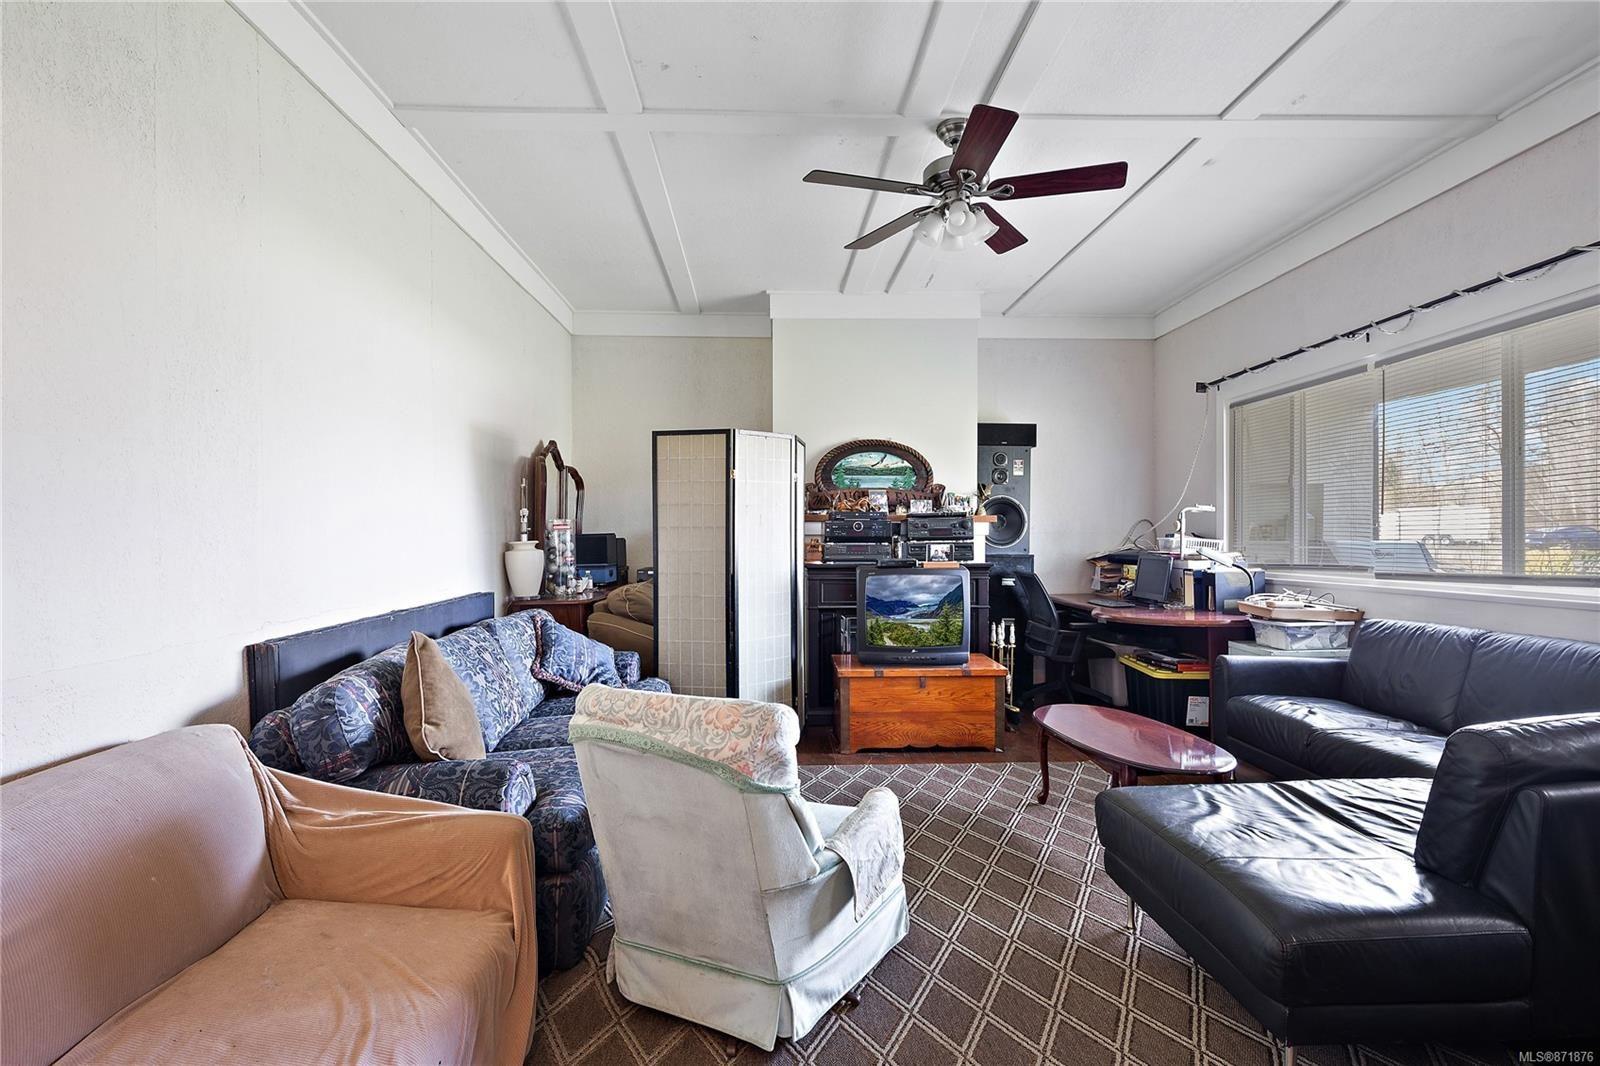 Photo 22: Photos: 4420 Wilkinson Rd in : SW Royal Oak House for sale (Saanich West)  : MLS®# 871876